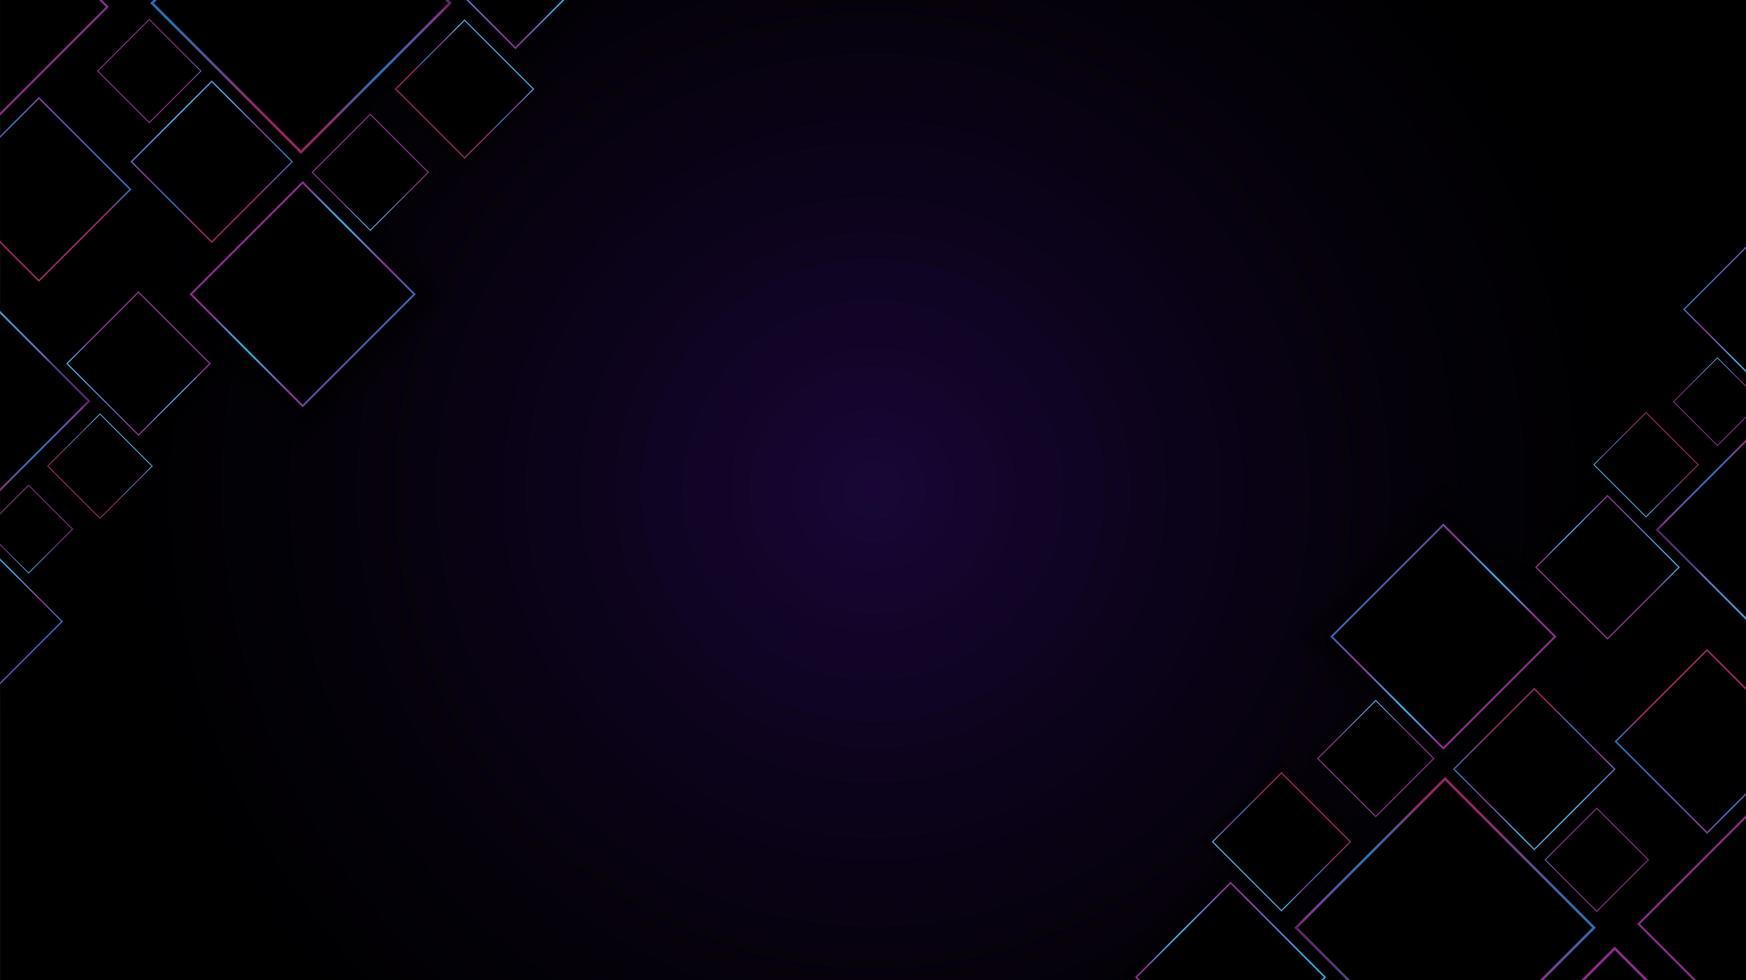 paarse achtergrond met kleurovergang met vierkante roze en blauwe frames vector